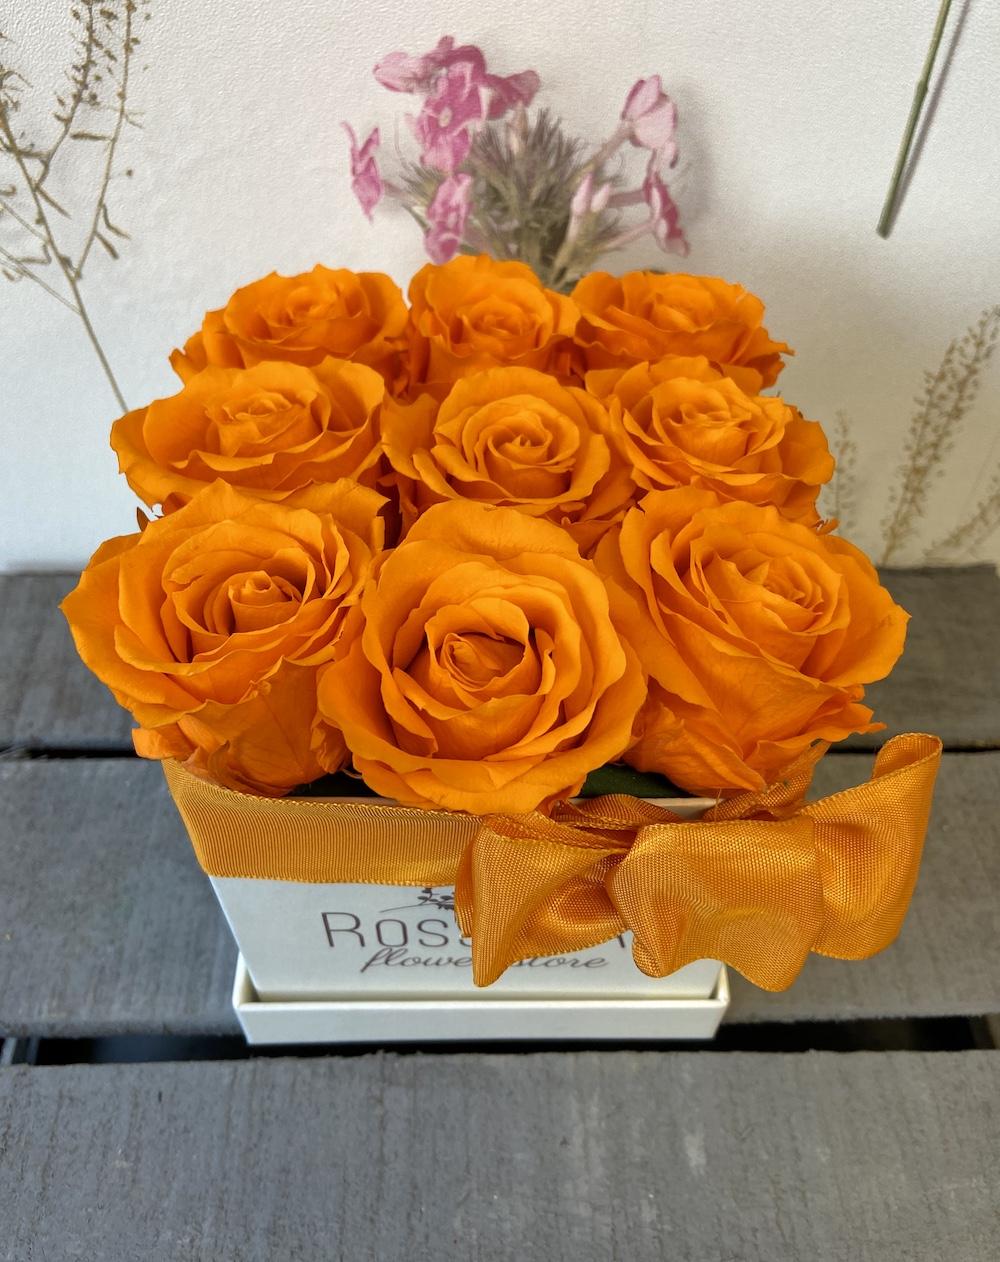 arancioflower box rose stabilizzate florashopping Rossana flower store NovellinoIMG_0366